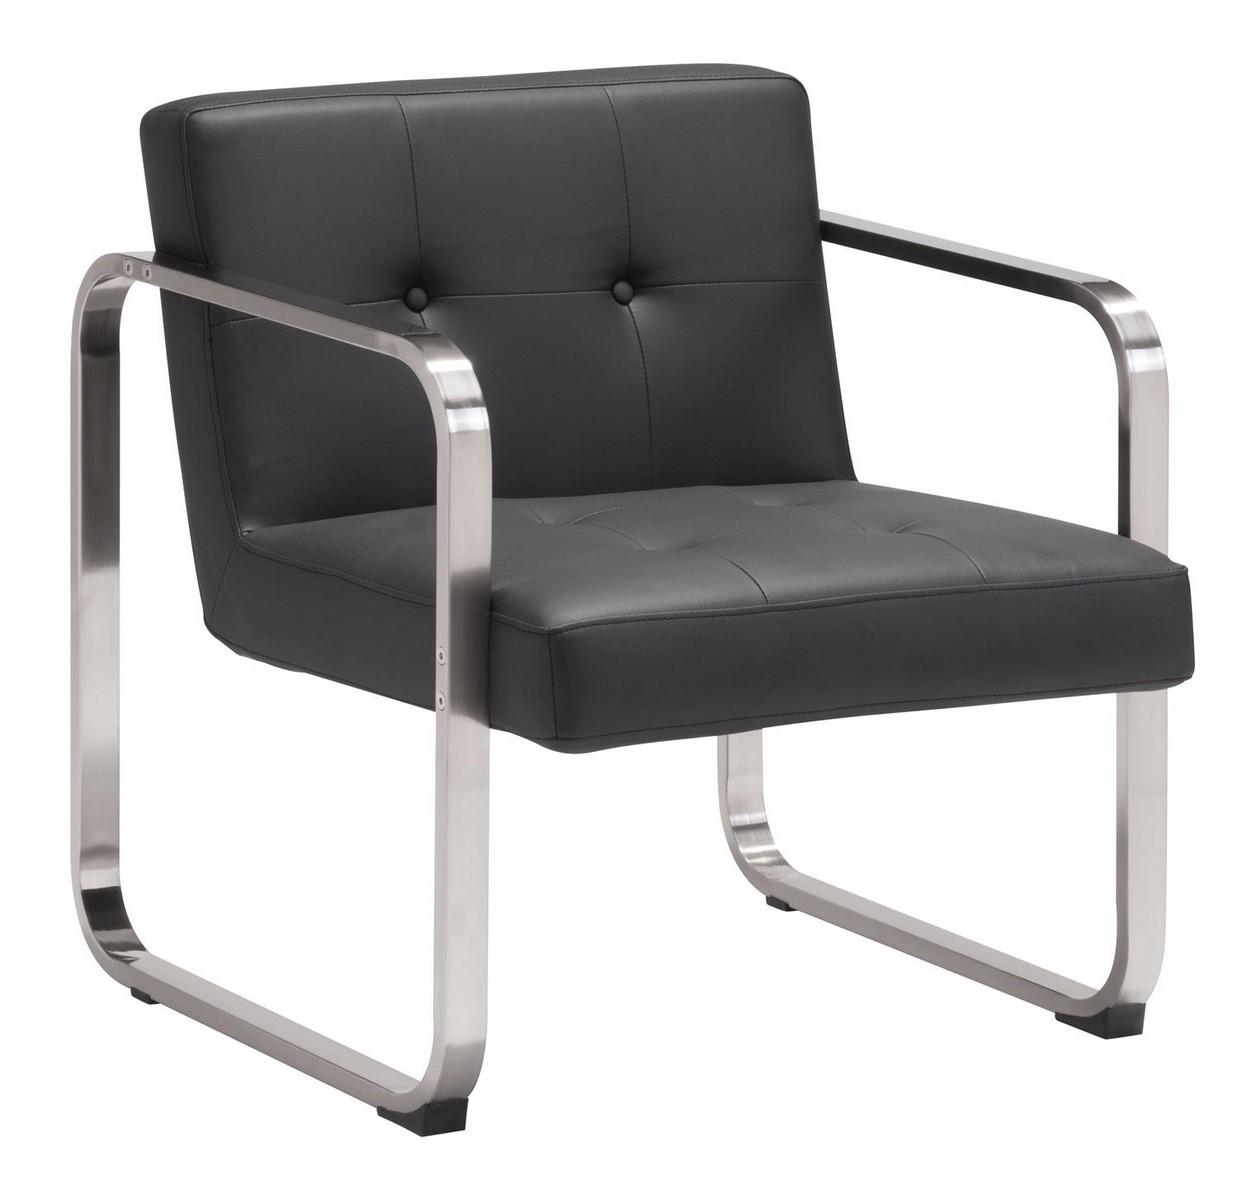 Zuo Modern Varietal Arm Chair - Black